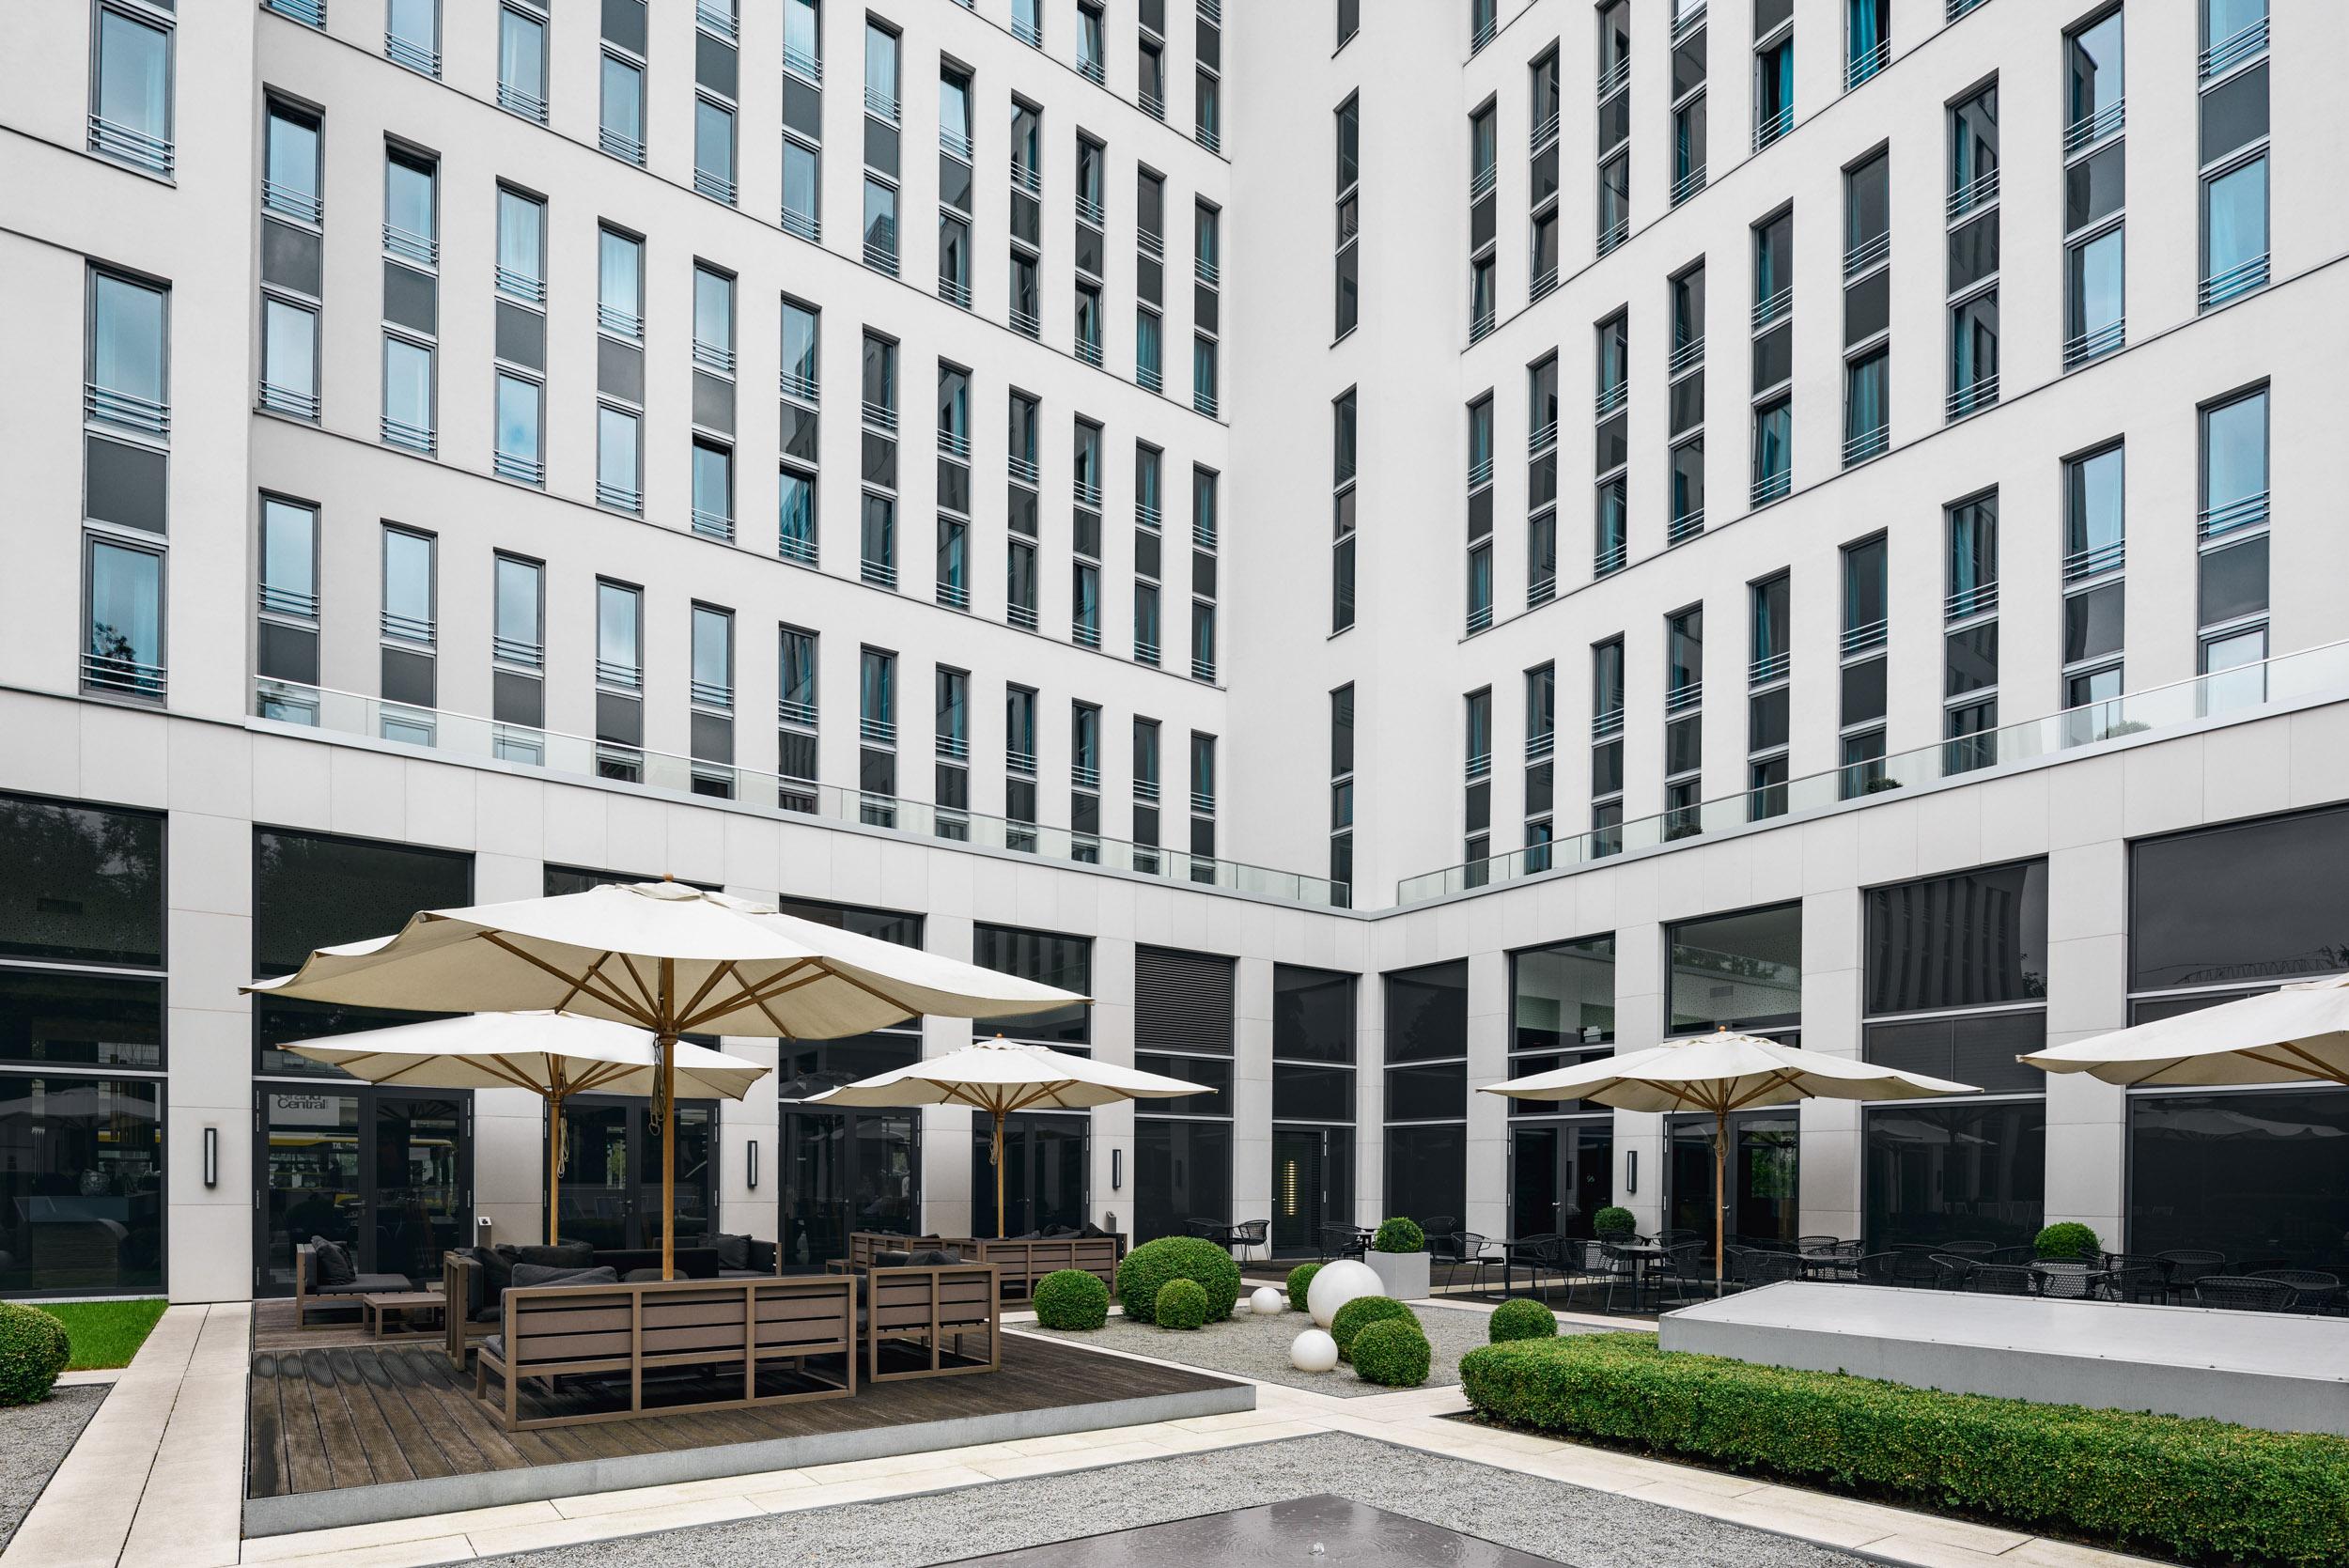 Gustav-Epple-Bauunternehmung-Motel-One-Berlin-HBF-MLX5783